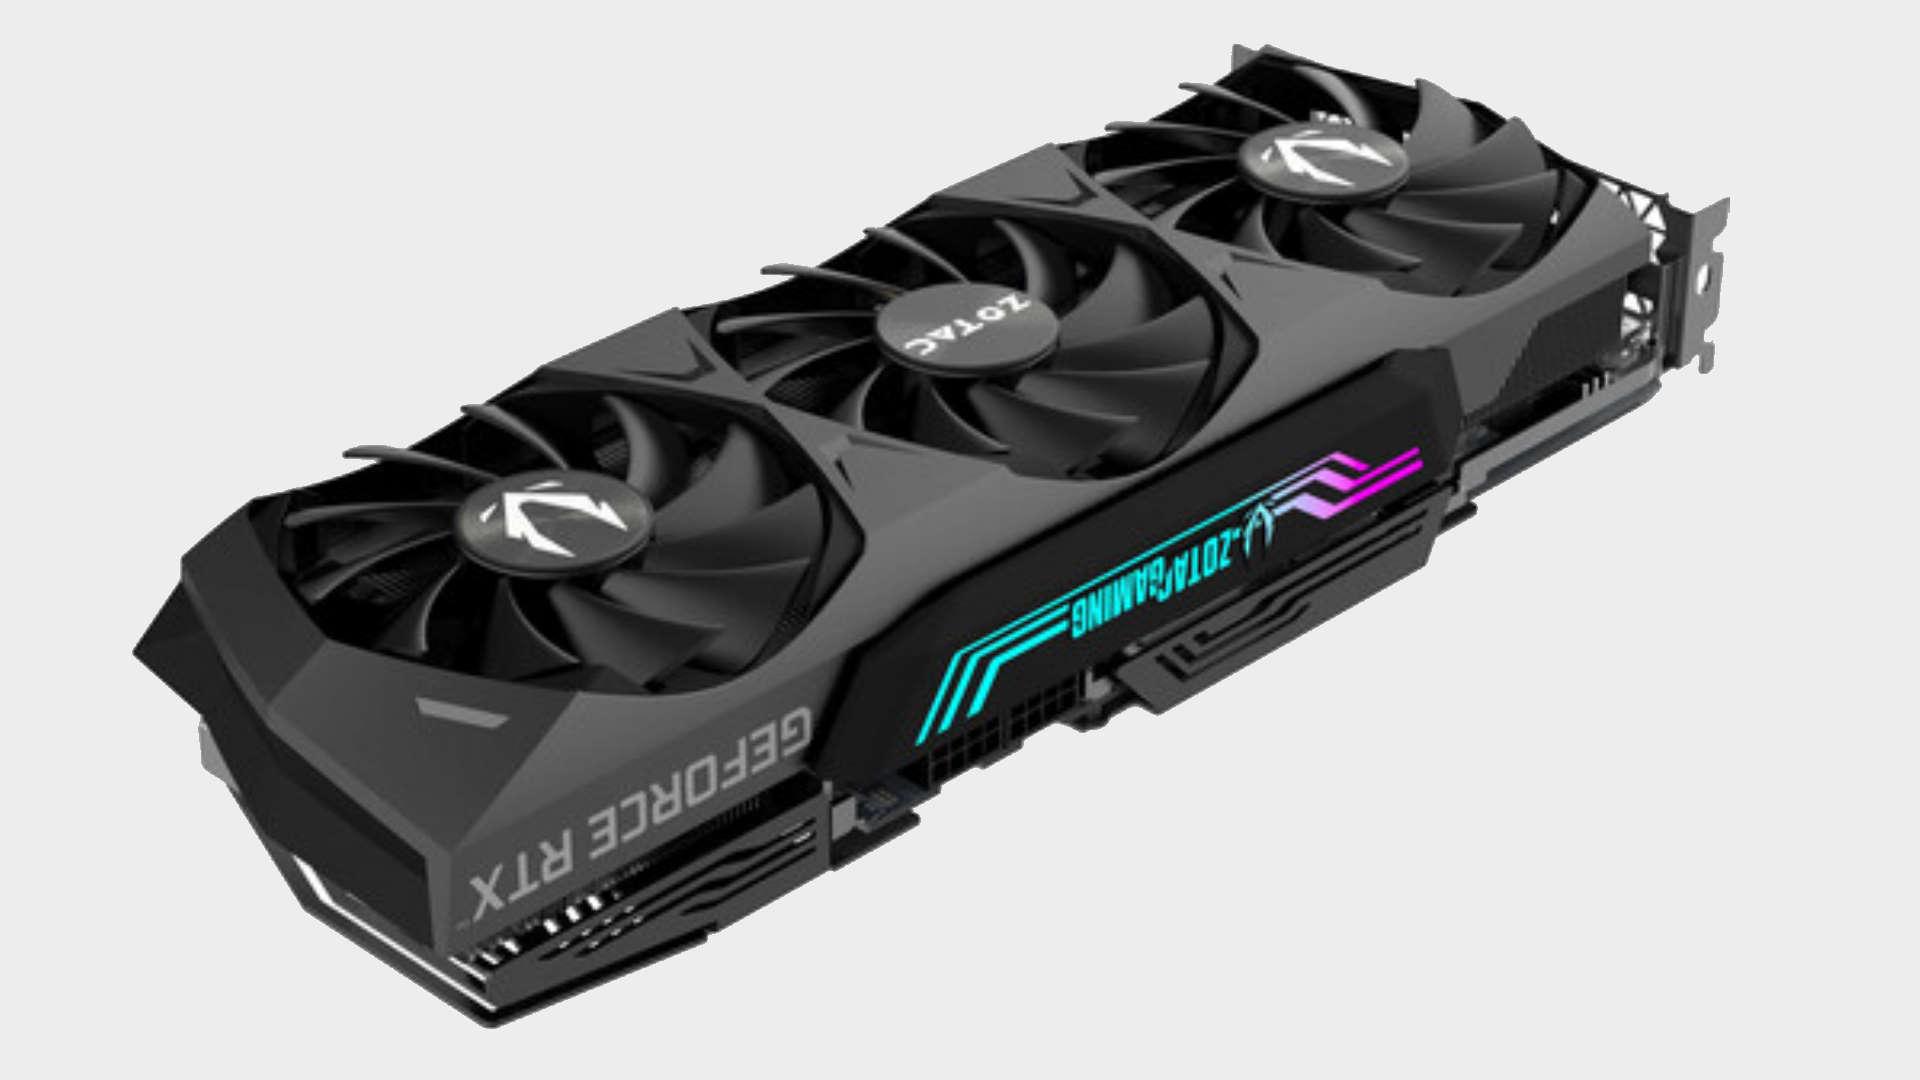 Nvidia zotac rtx 3080 graphics card black friday non deal